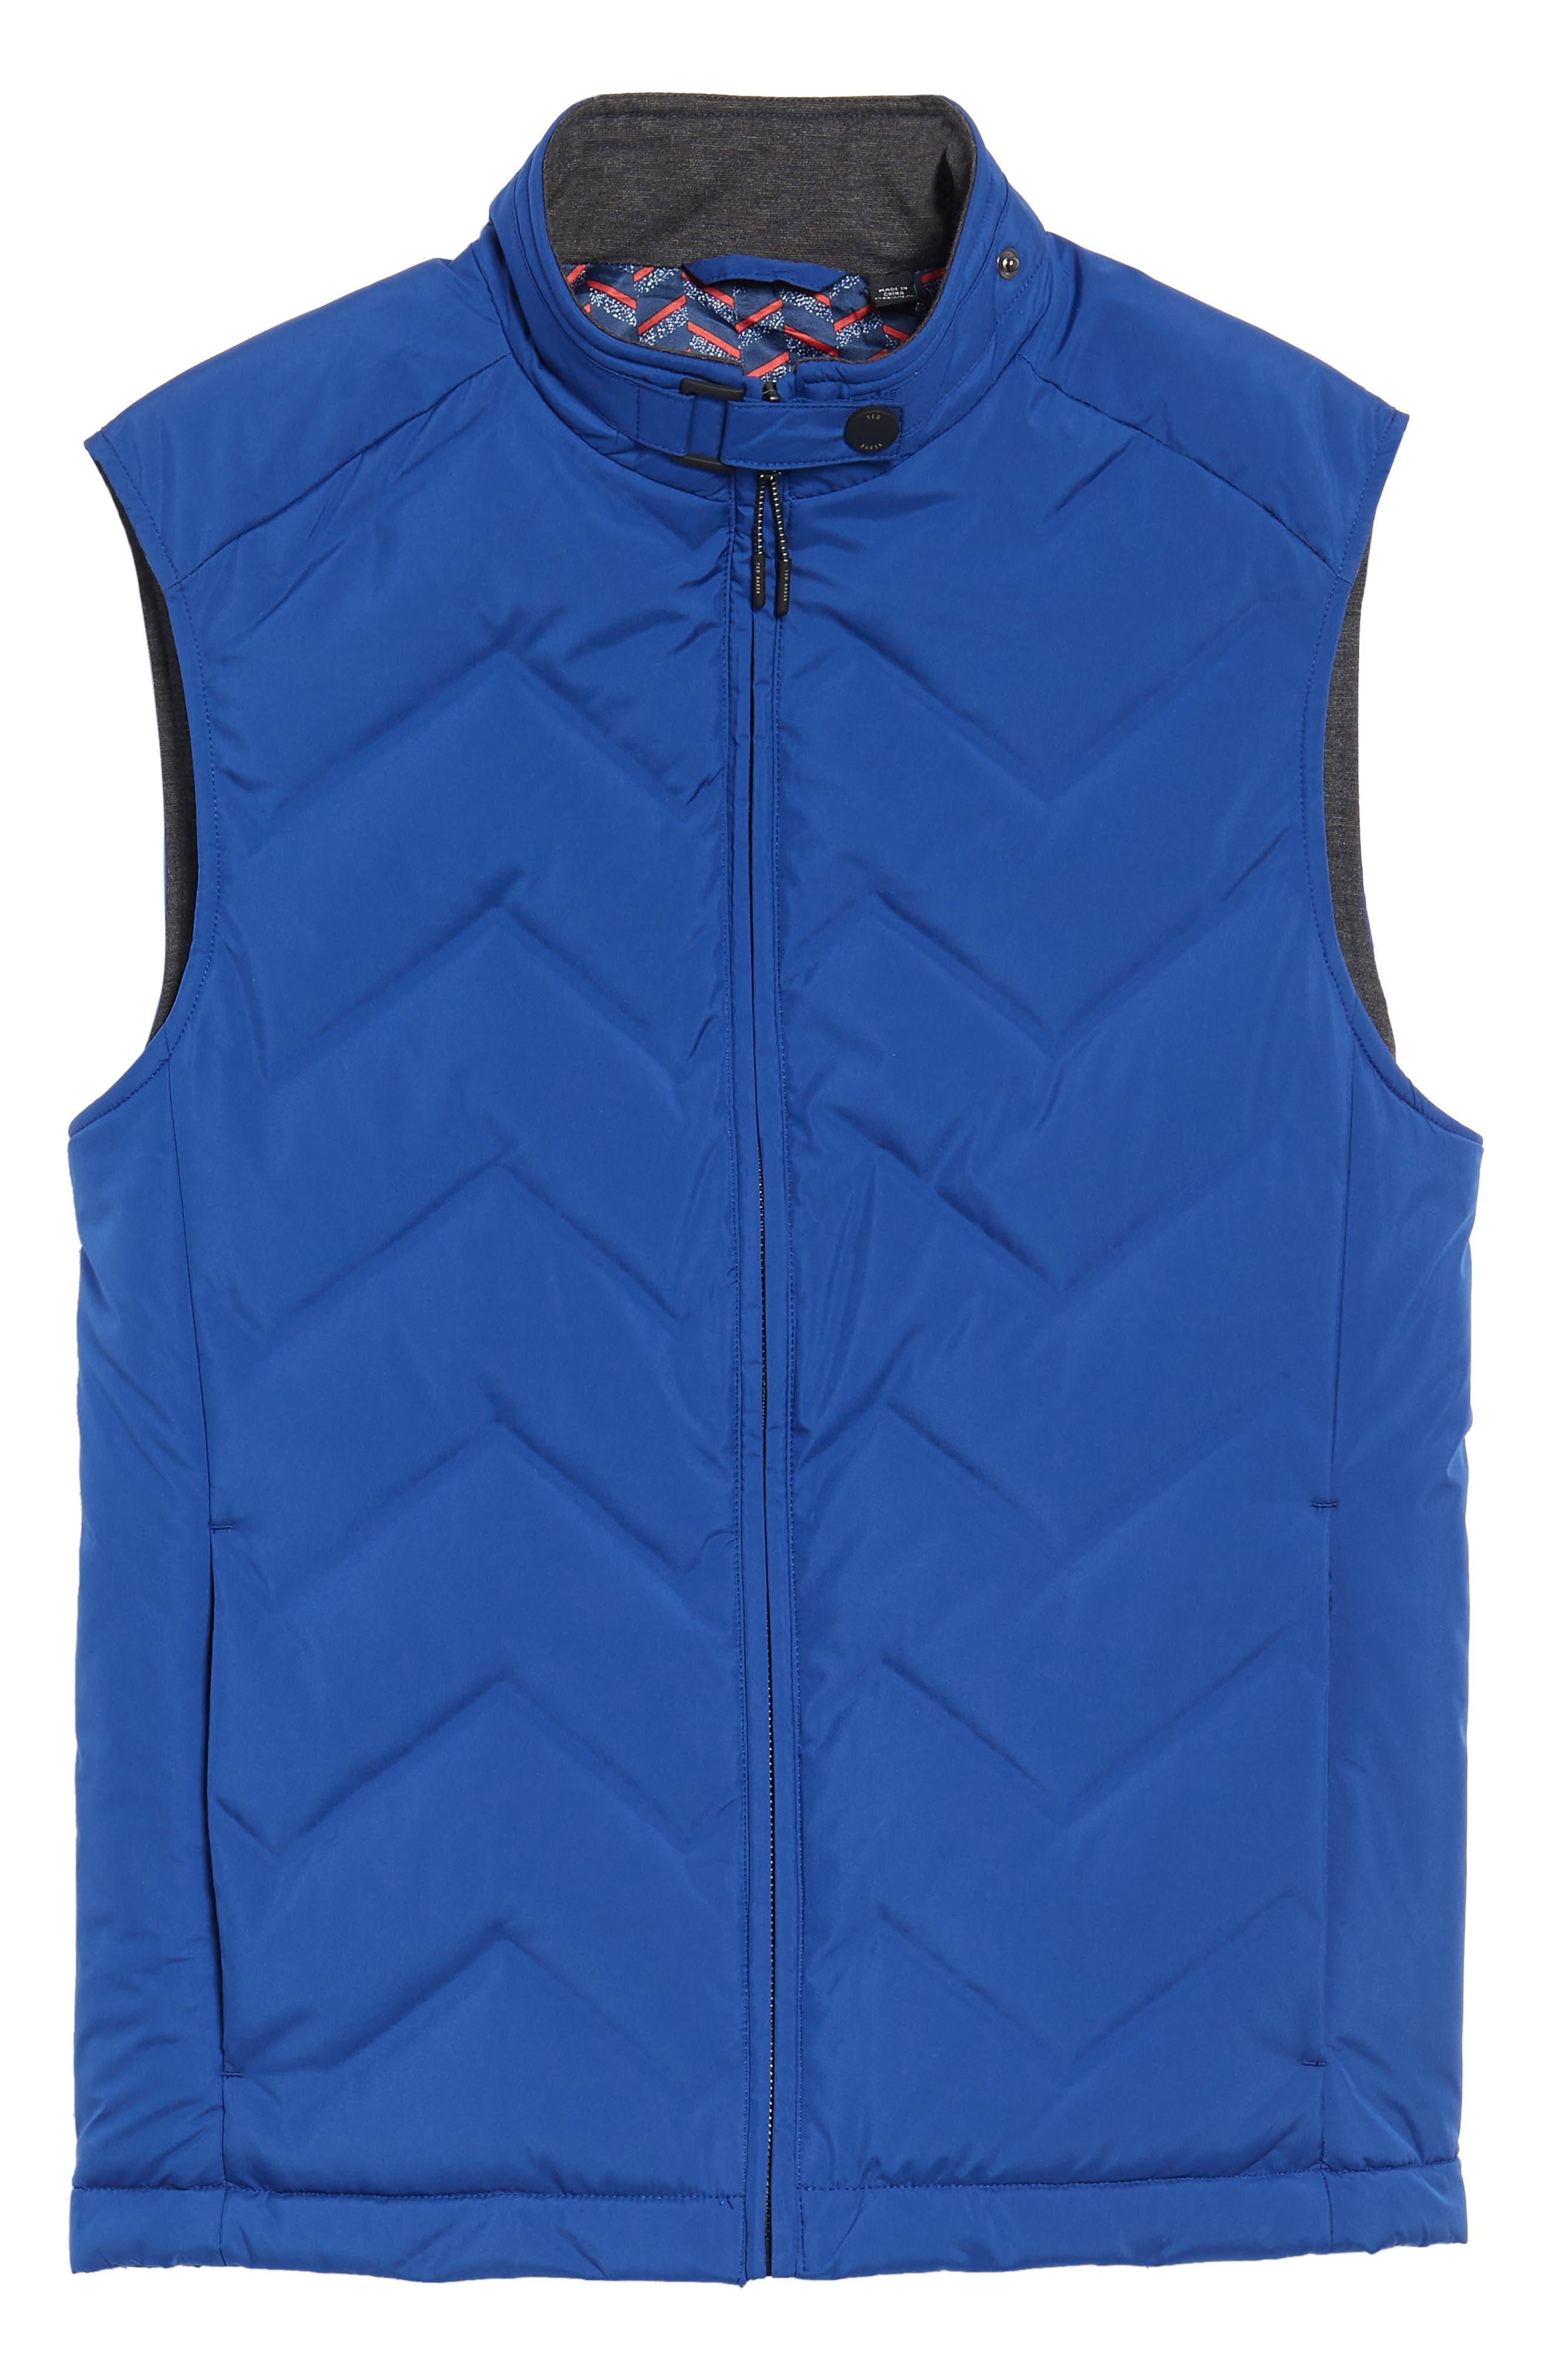 Hobart Down Vest,                             Alternate thumbnail 5, color,                             BRIGHT BLUE